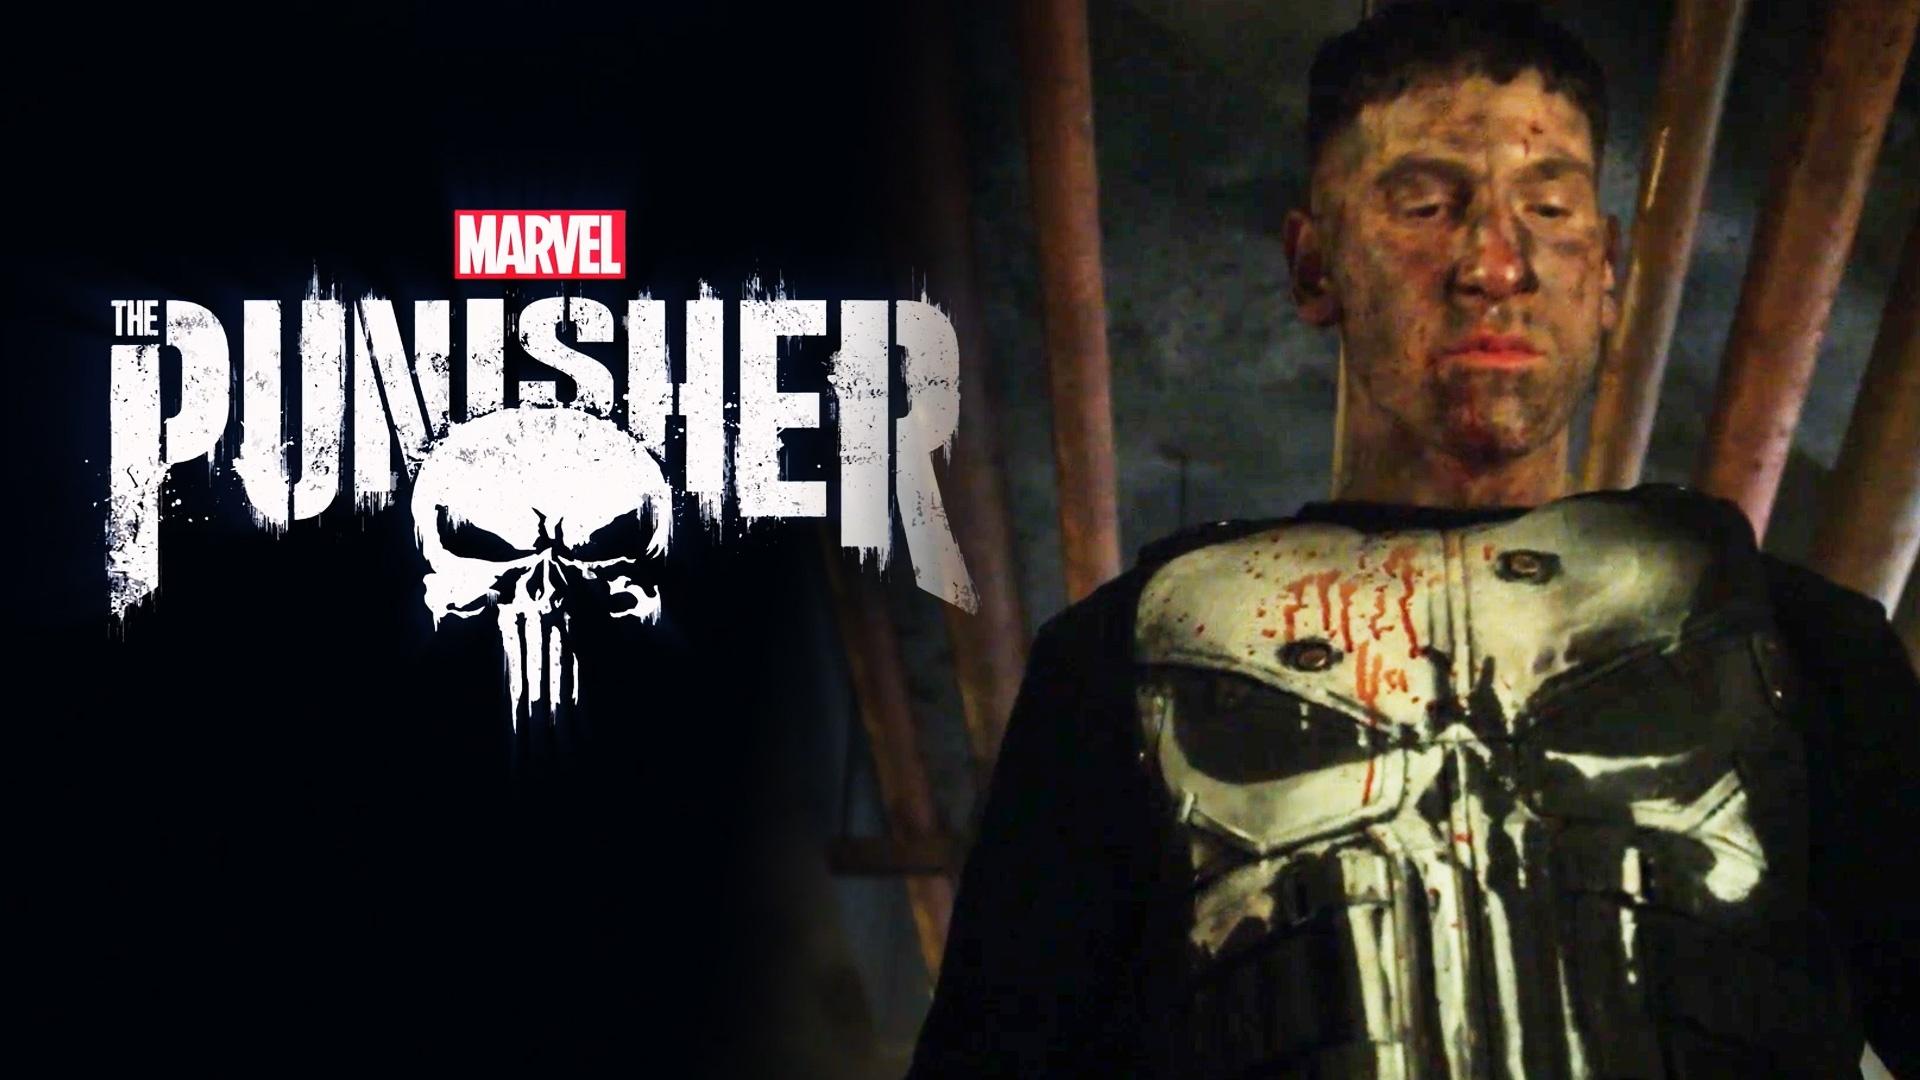 Marvel's The Punisher - Netflix kündigt Staffel 2 für Januar 2019 an